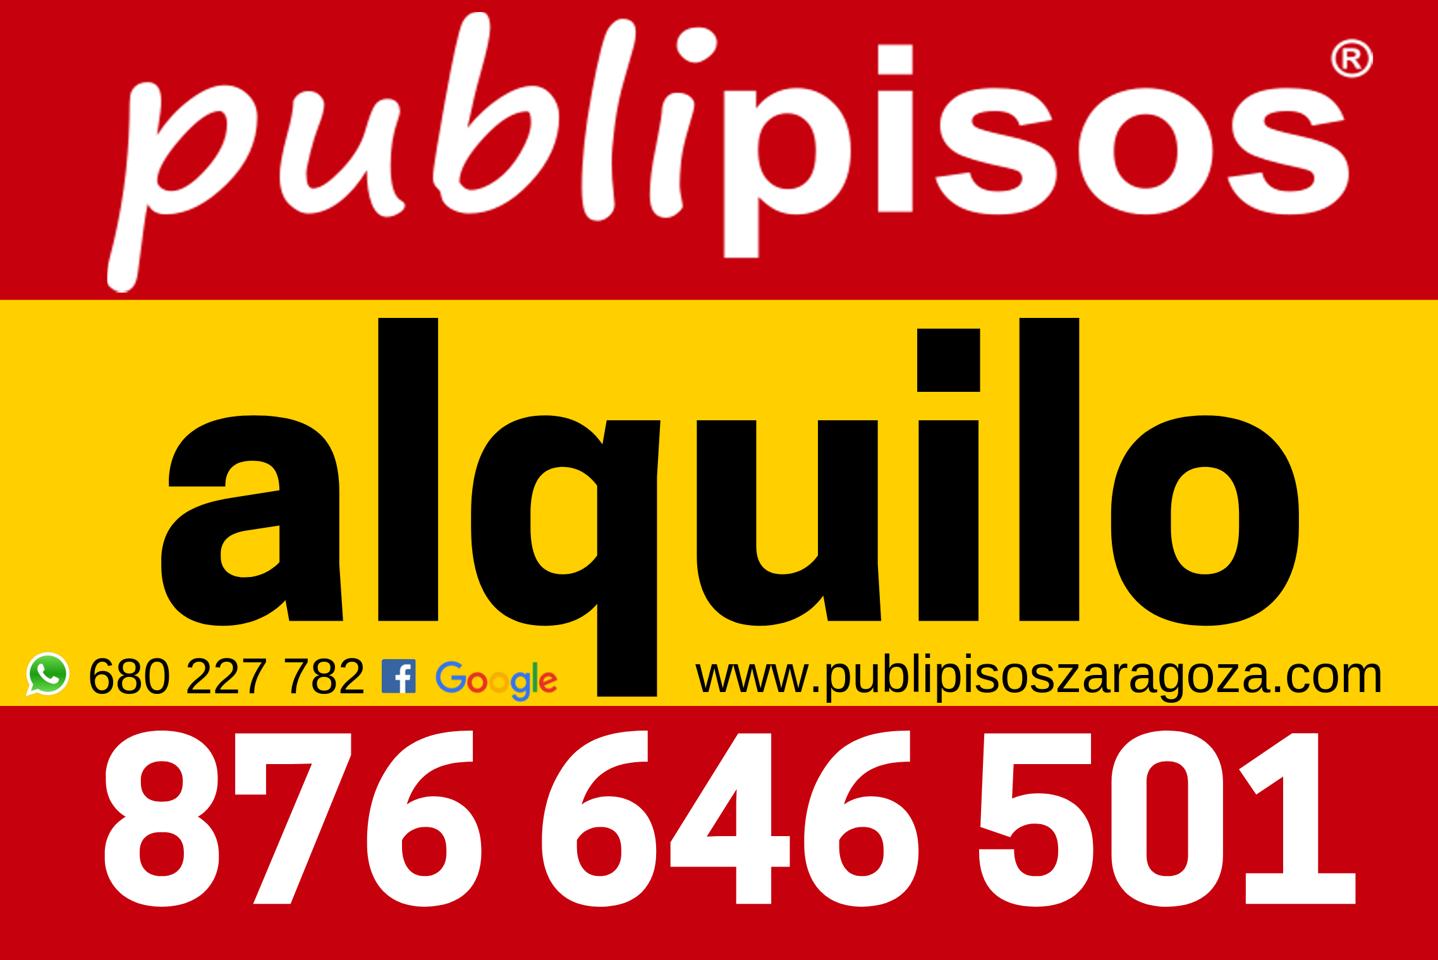 Piso alquiler con garaje Plaza del Pilar-32